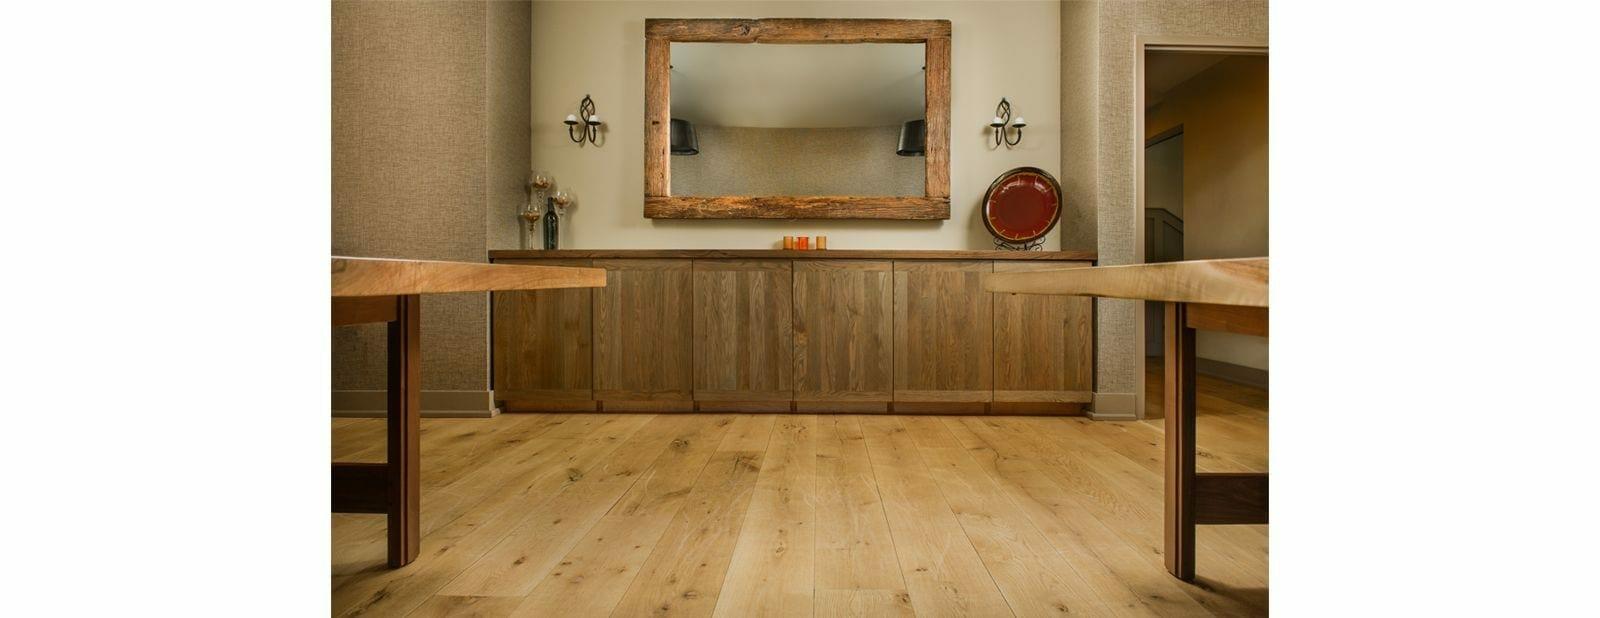 Almshouse custom cabinet